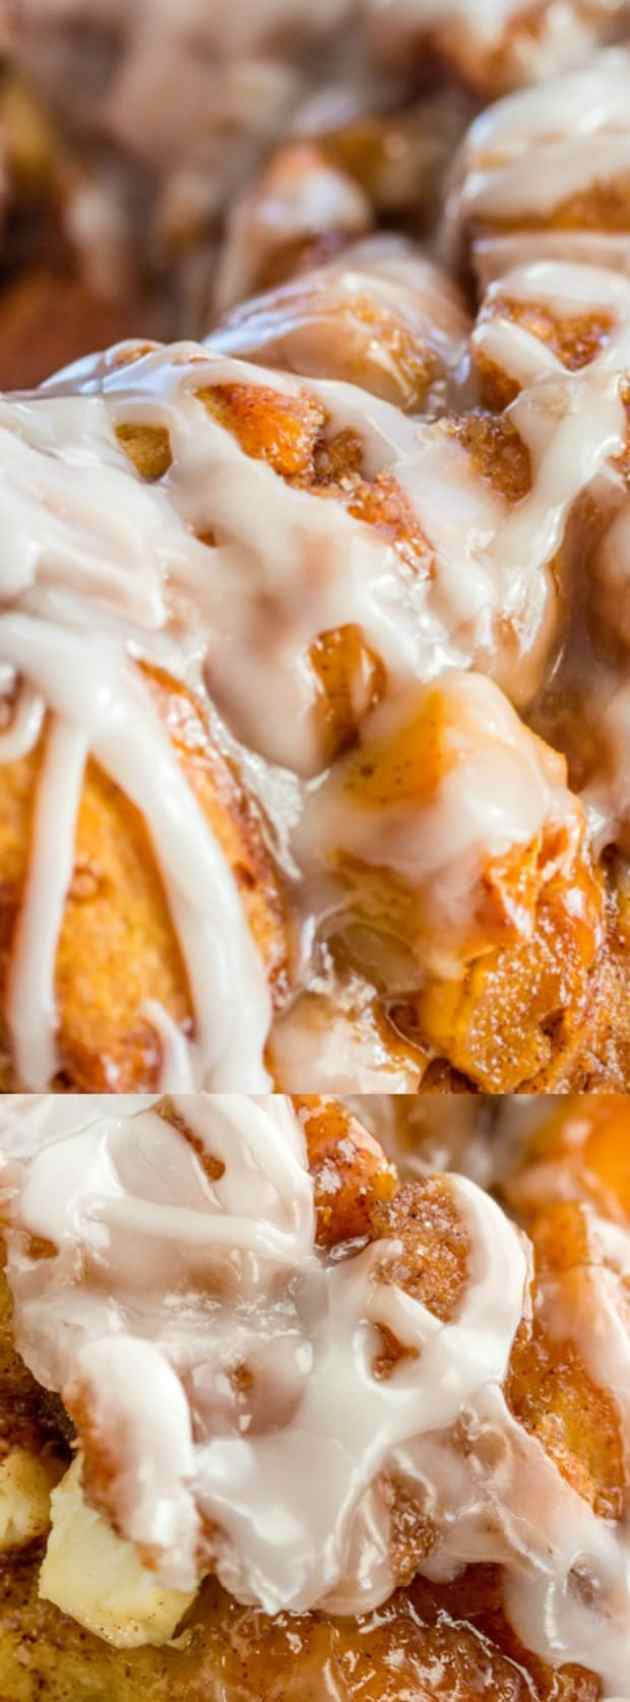 Cream Cheese Caramel Roll Pull Apart Bread Longpin